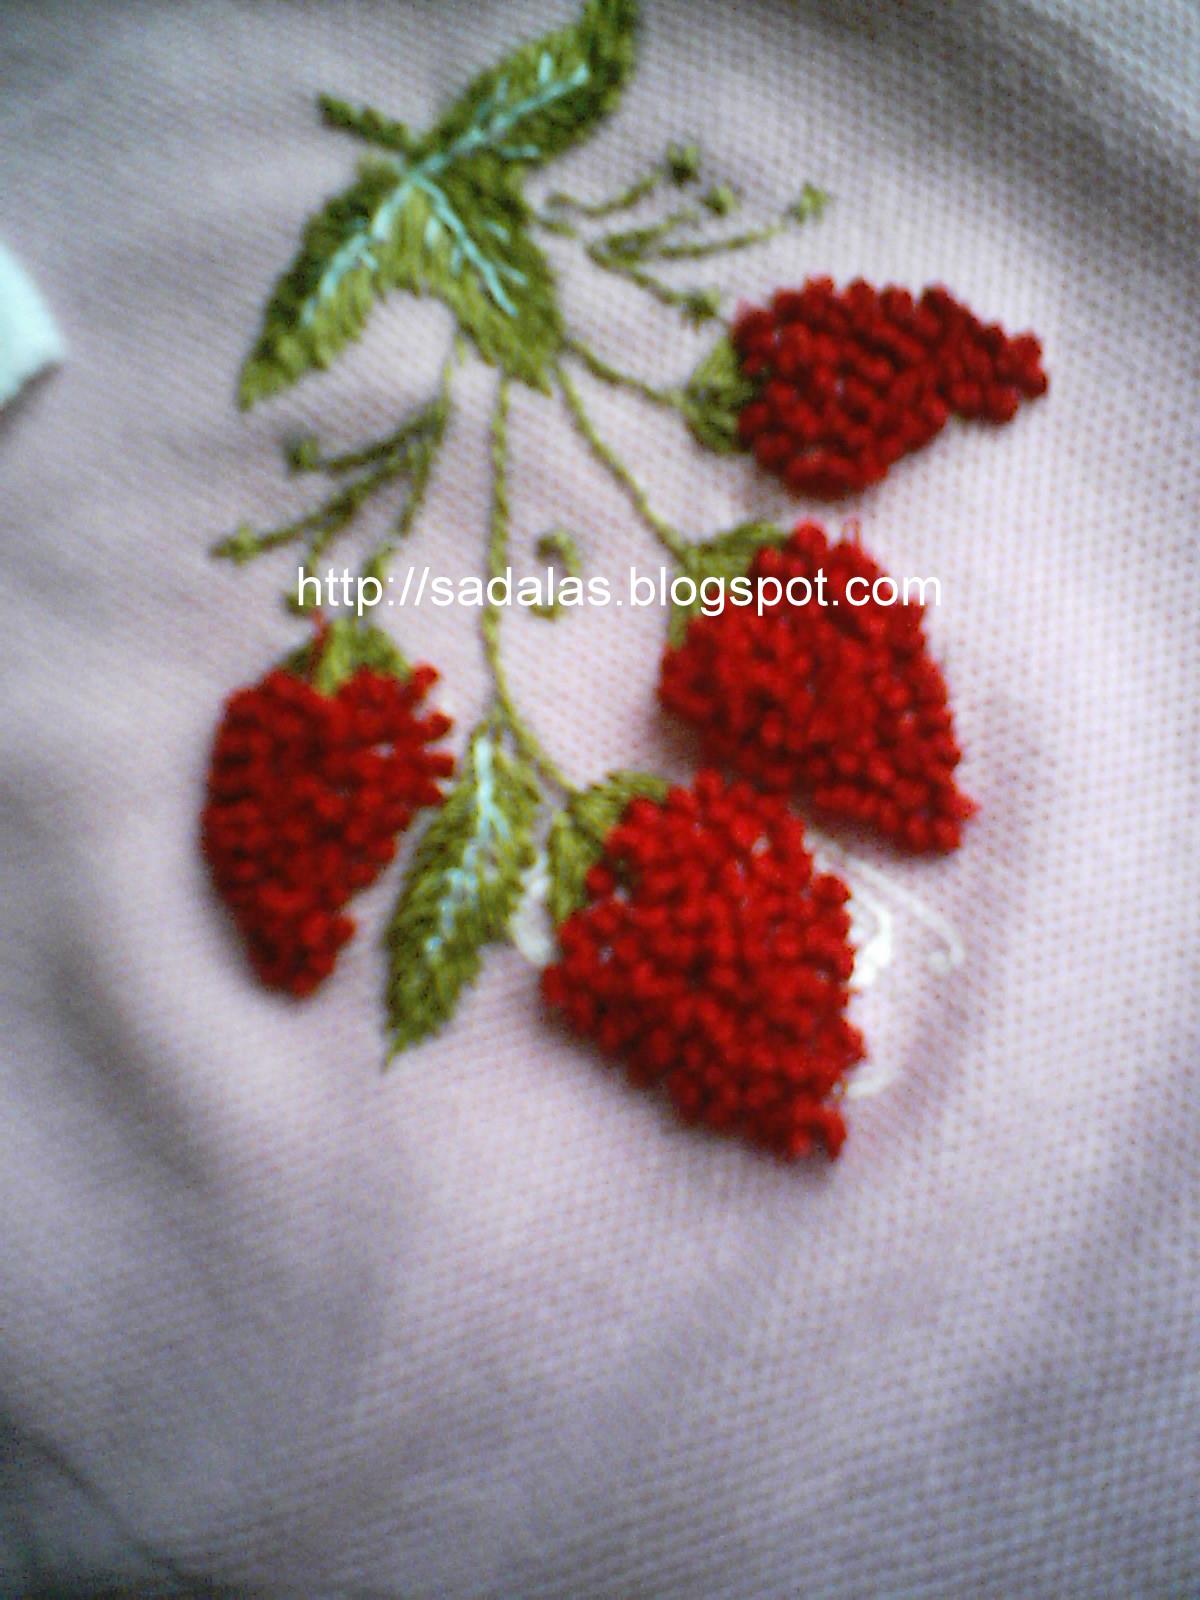 French Knot Stitch Embroidery Designs   www.imgkid.com ...